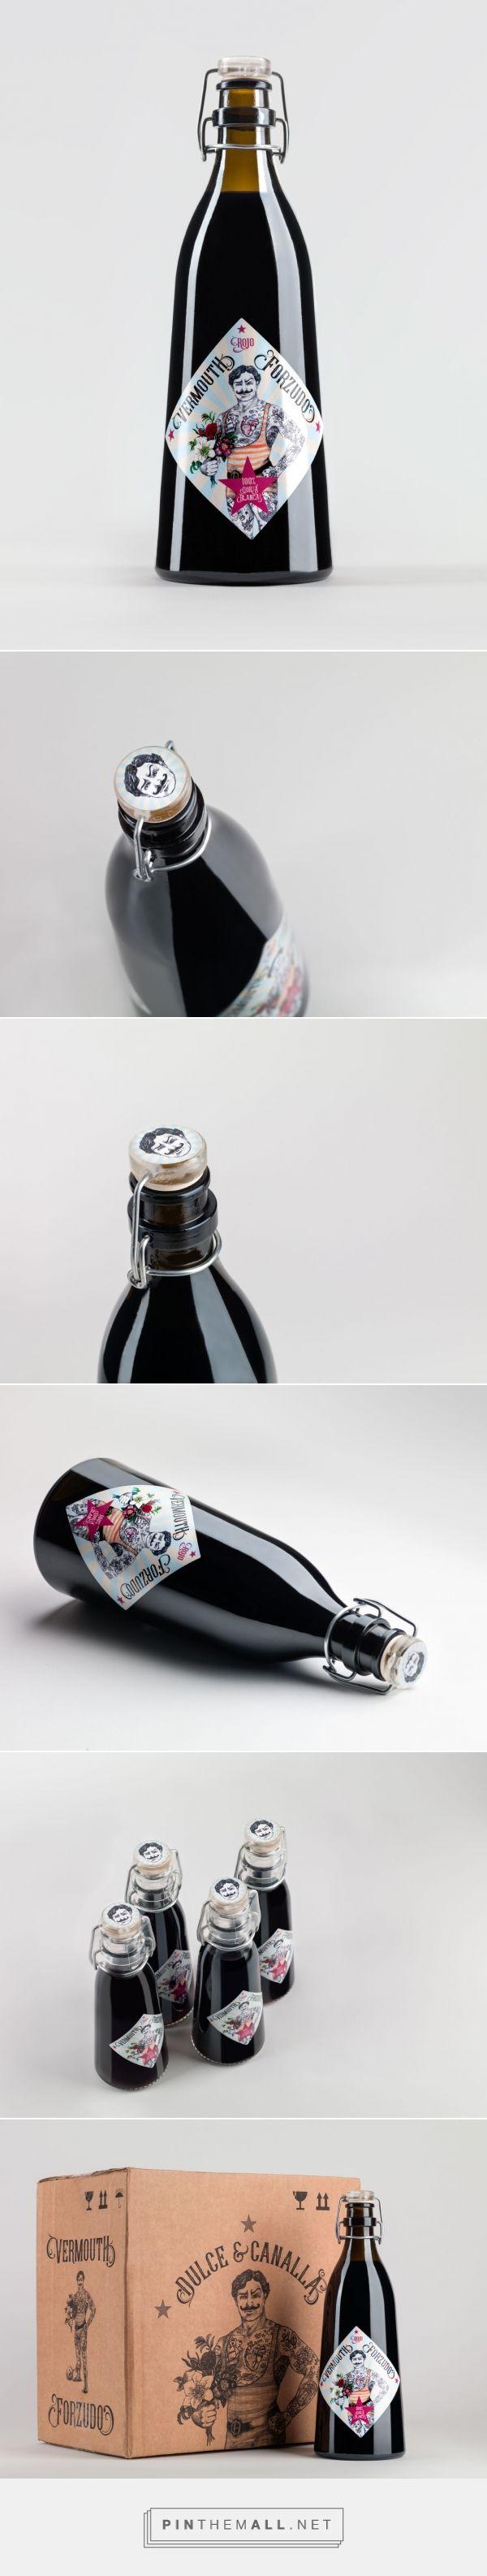 Vermouth Forzudo packaging design by castillosdearena - https://www.packagingoftheworld.com/2018/03/vermouth-forzudo.html